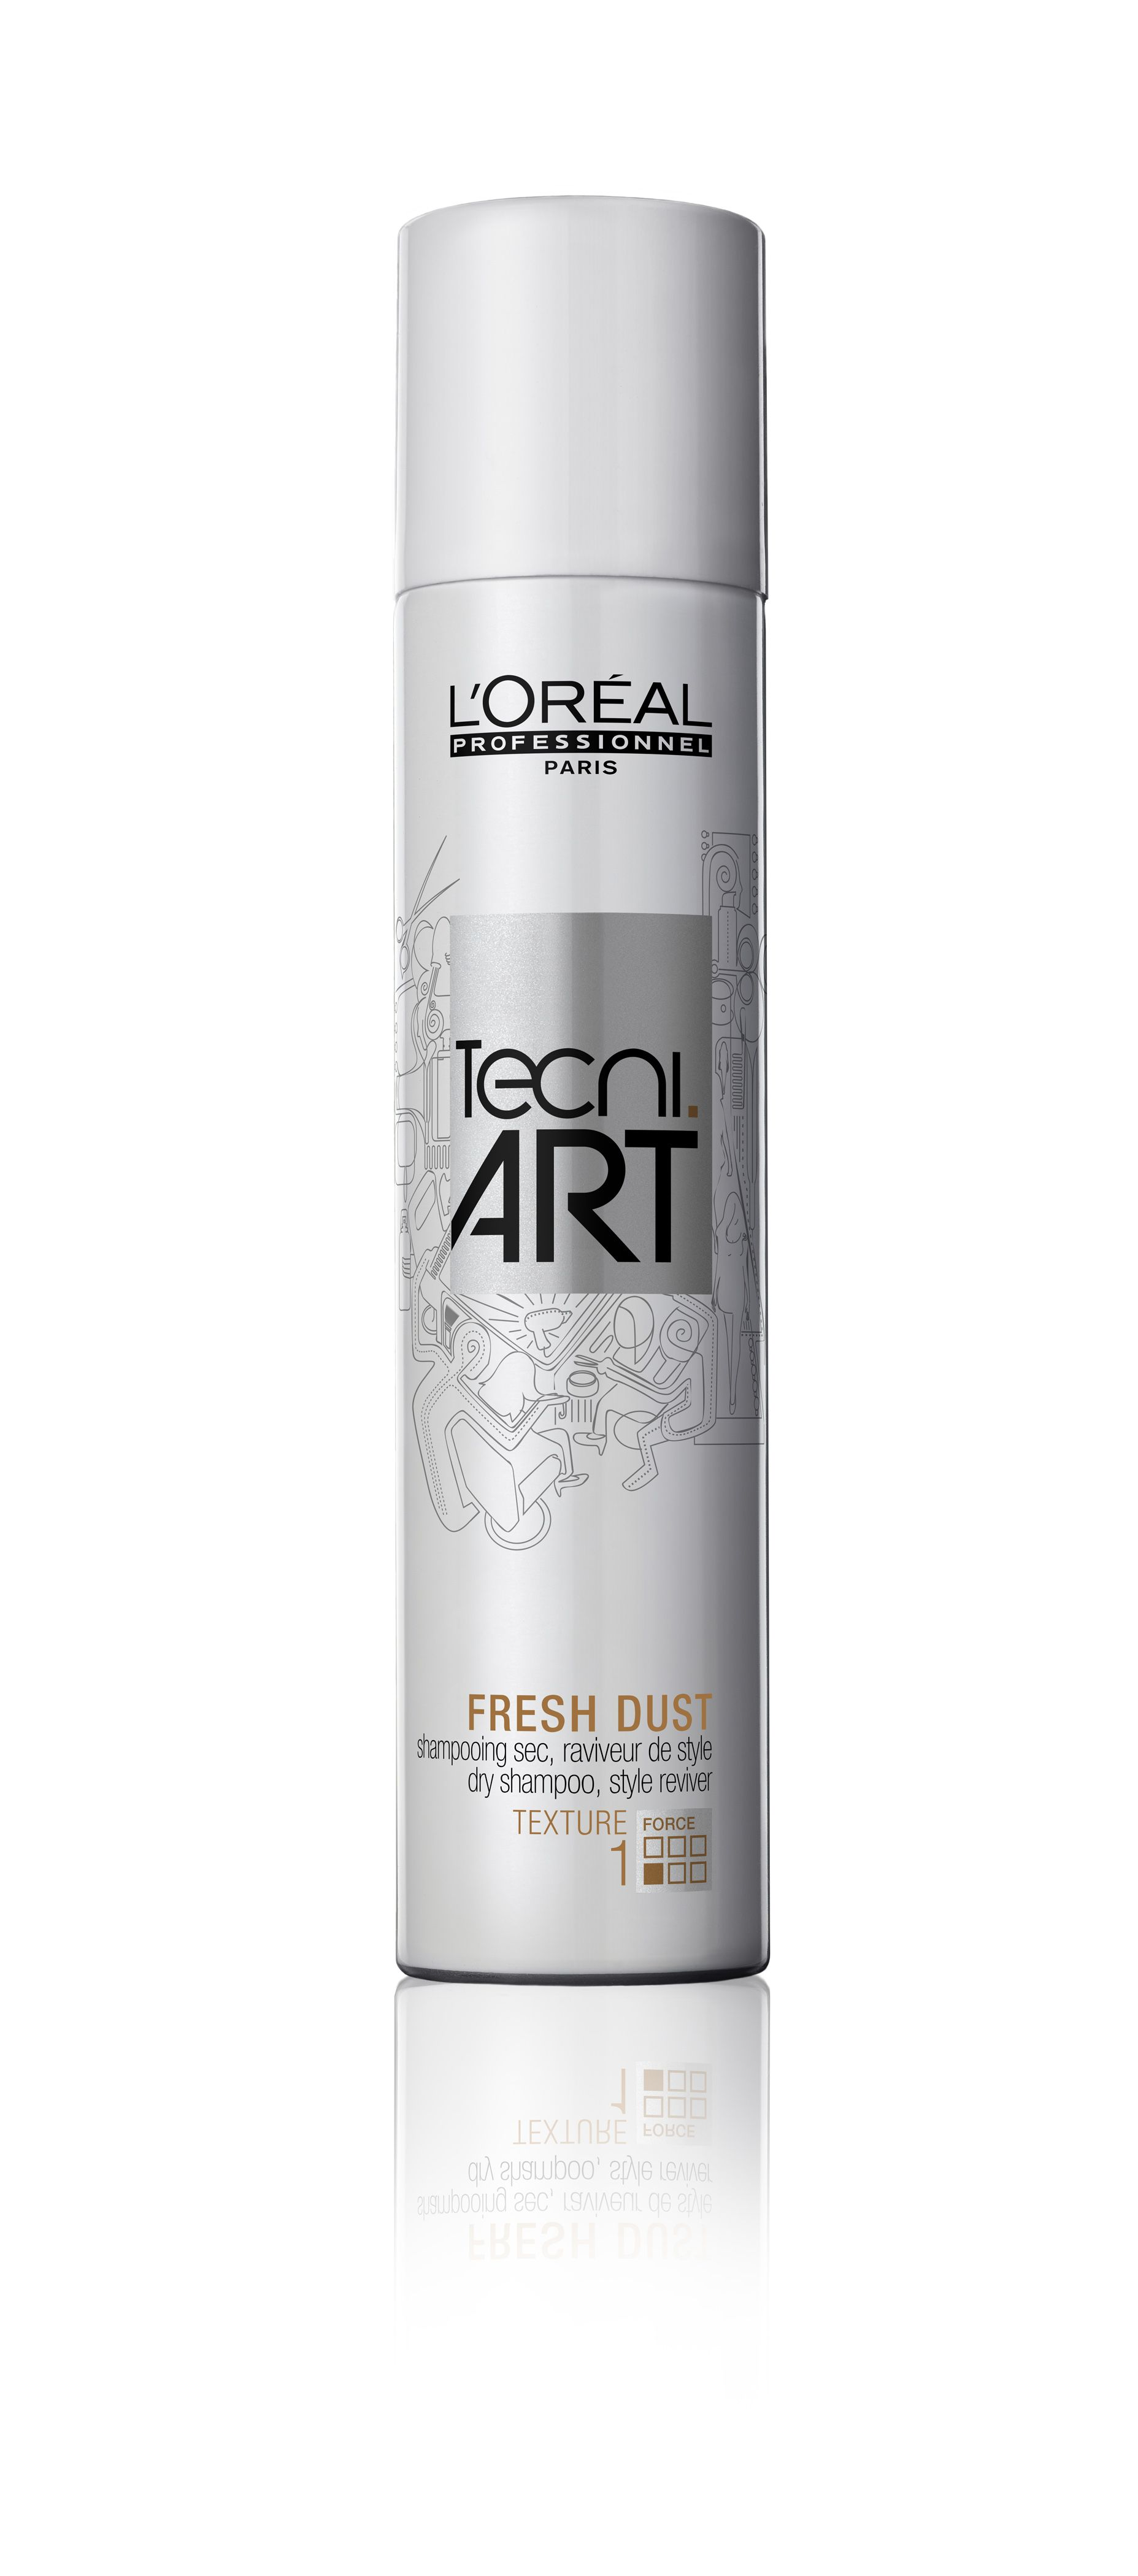 L Oreal Professionnel Tecni Art Texture Fresh Dust Dry Shampoo Style Reviver 150ml Dry Shampoo Shampoo Loreal